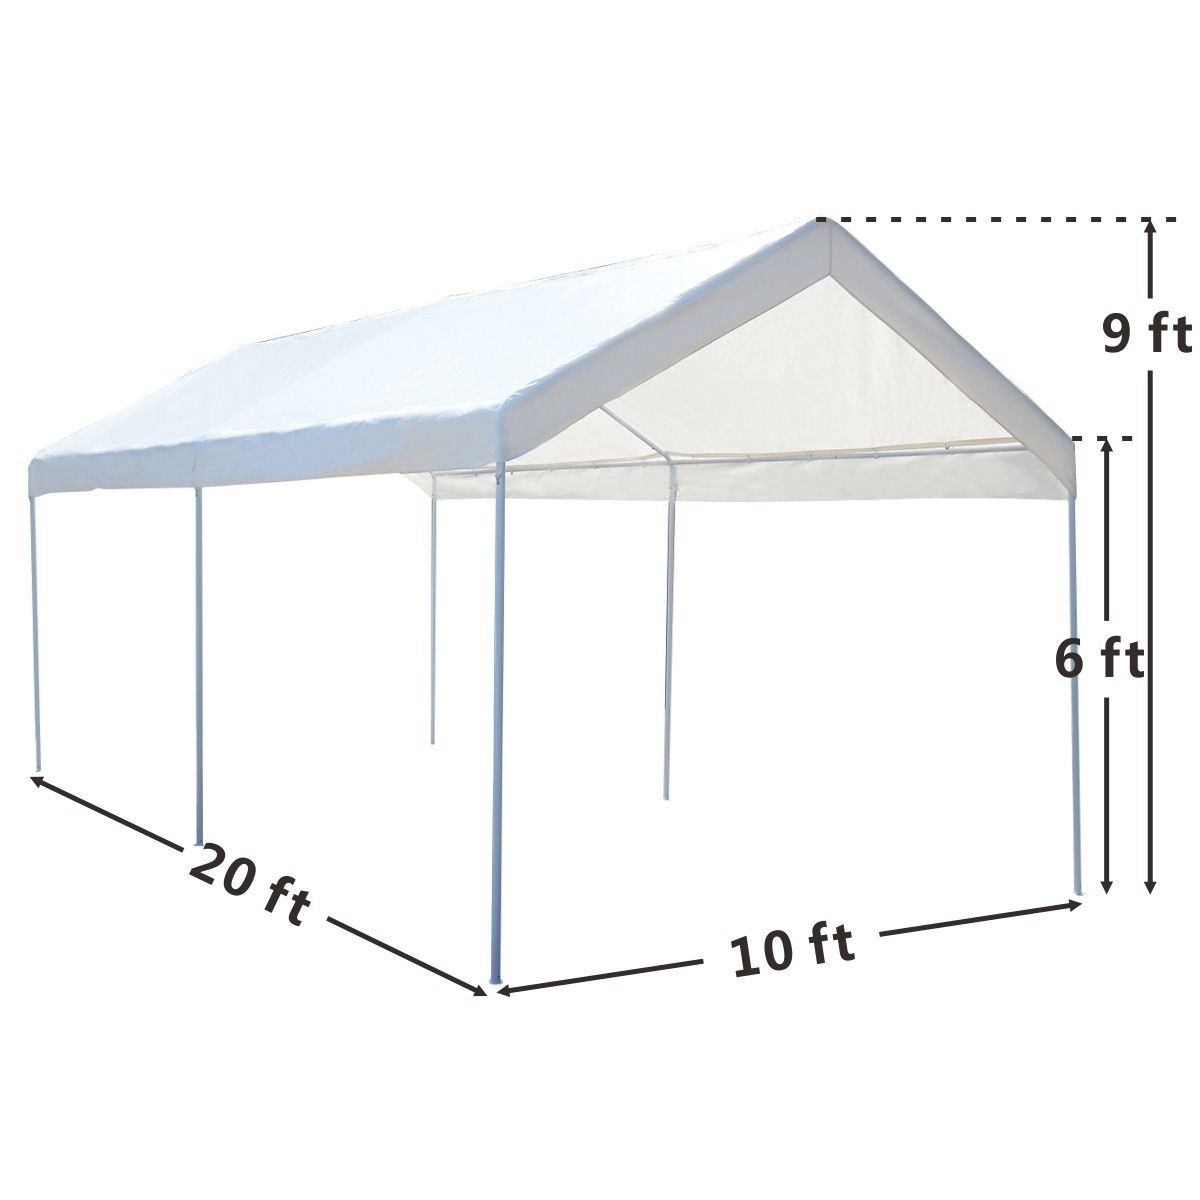 Car Steel Frame Canopy : Portable car carport garage cover steel frame canopy